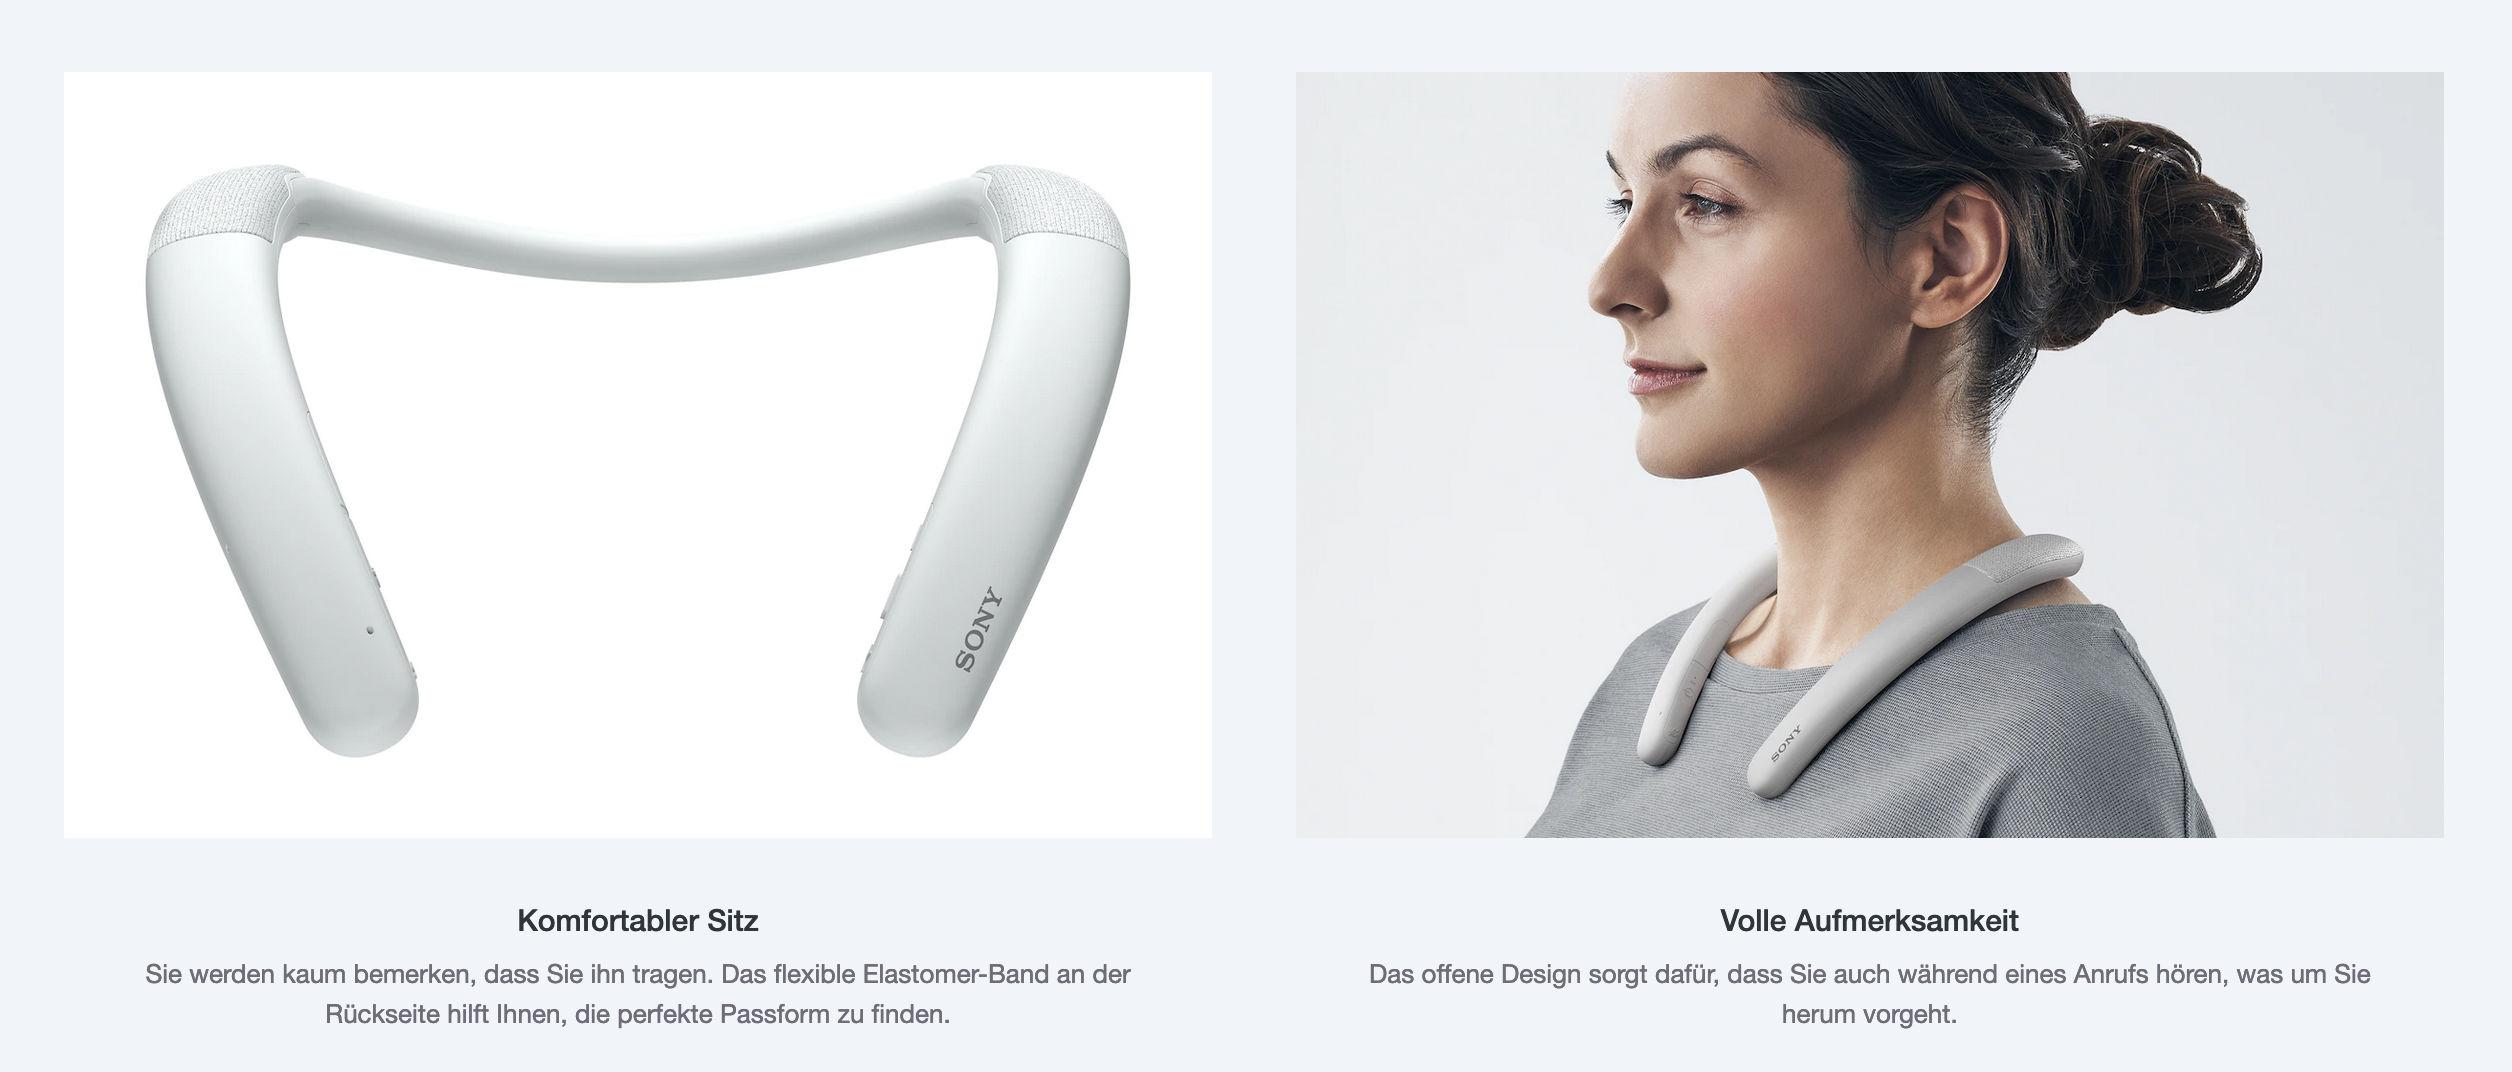 Sony Bluetooth Nackenbügel-Lautsprecher SRS-NB10